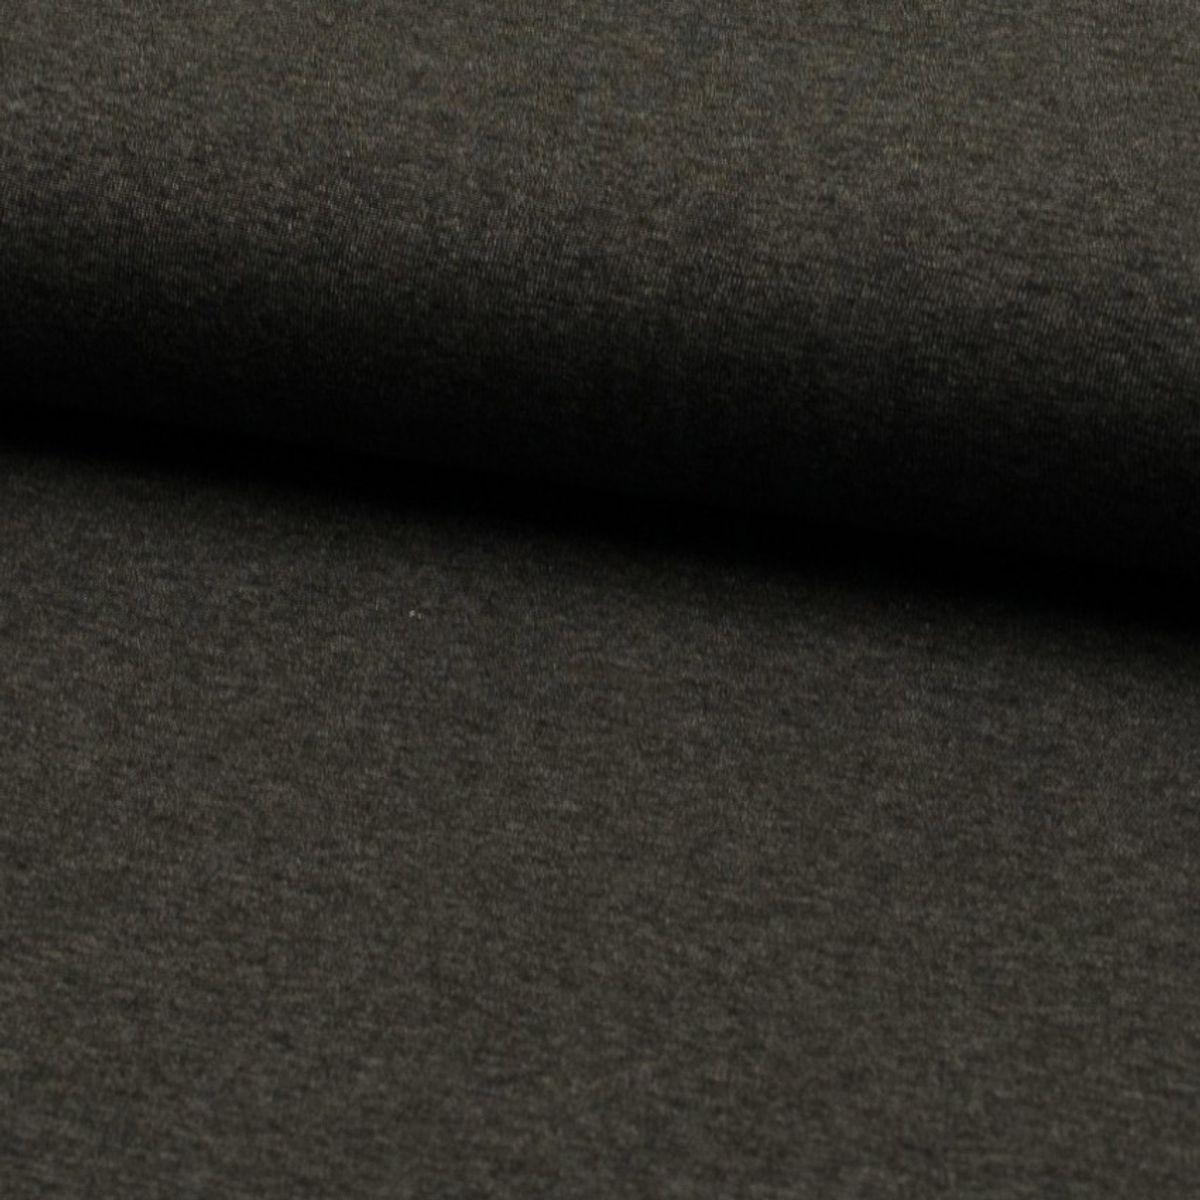 Tissu jersey viscose - Anthracite mélangé